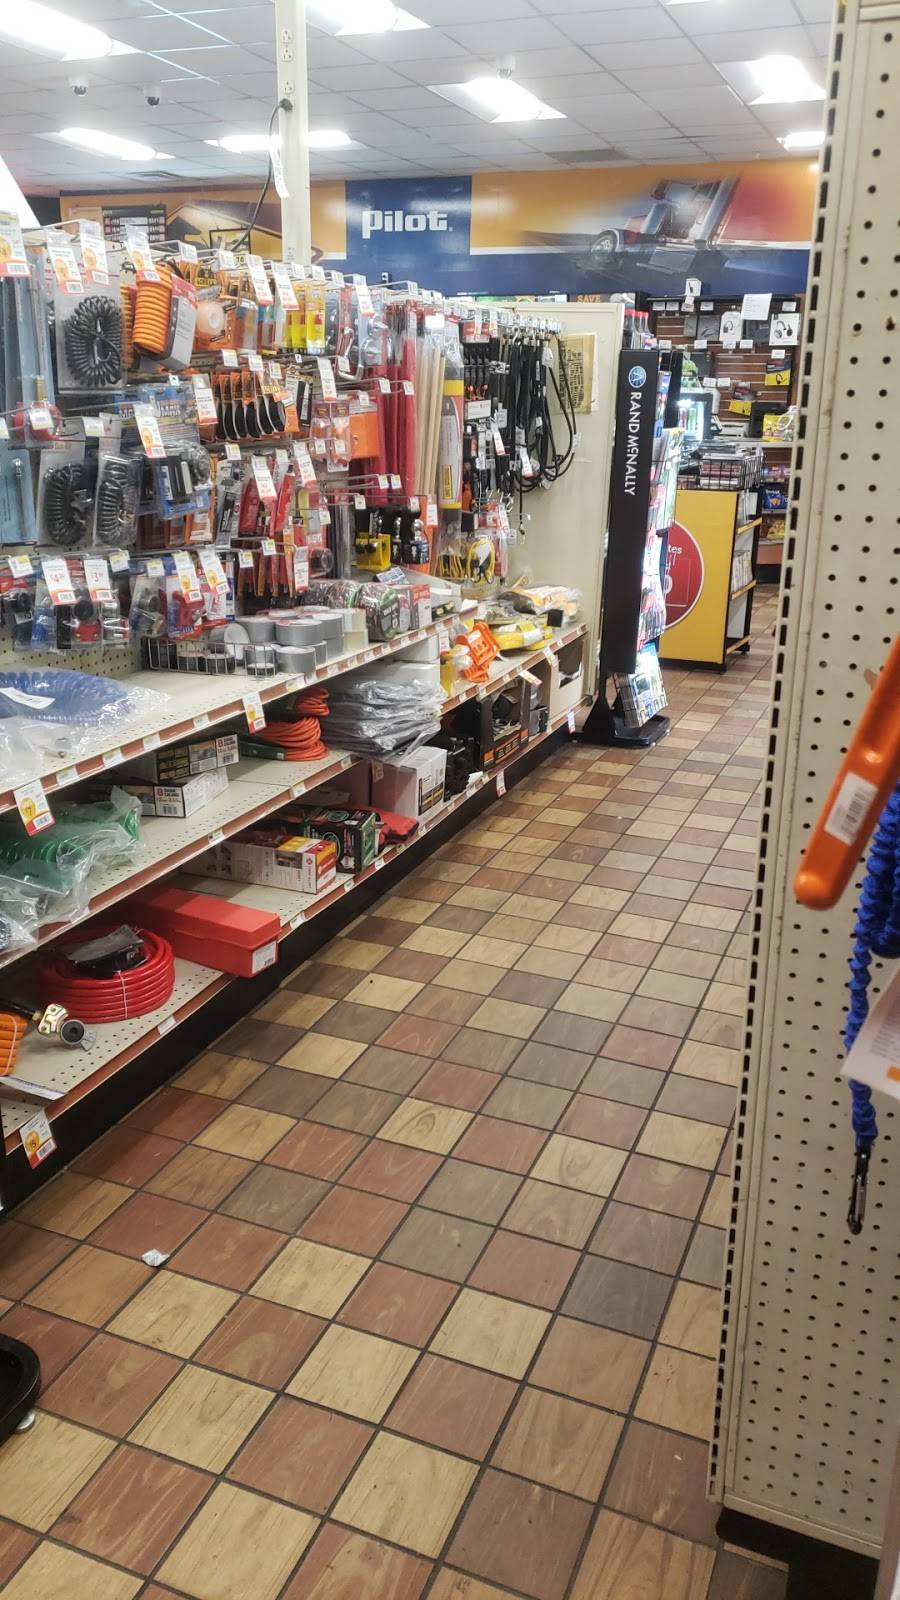 Pilot Travel Center - gas station  | Photo 4 of 9 | Address: 901 Bankhead Hwy W, Birmingham, AL 35204, USA | Phone: (205) 324-4532